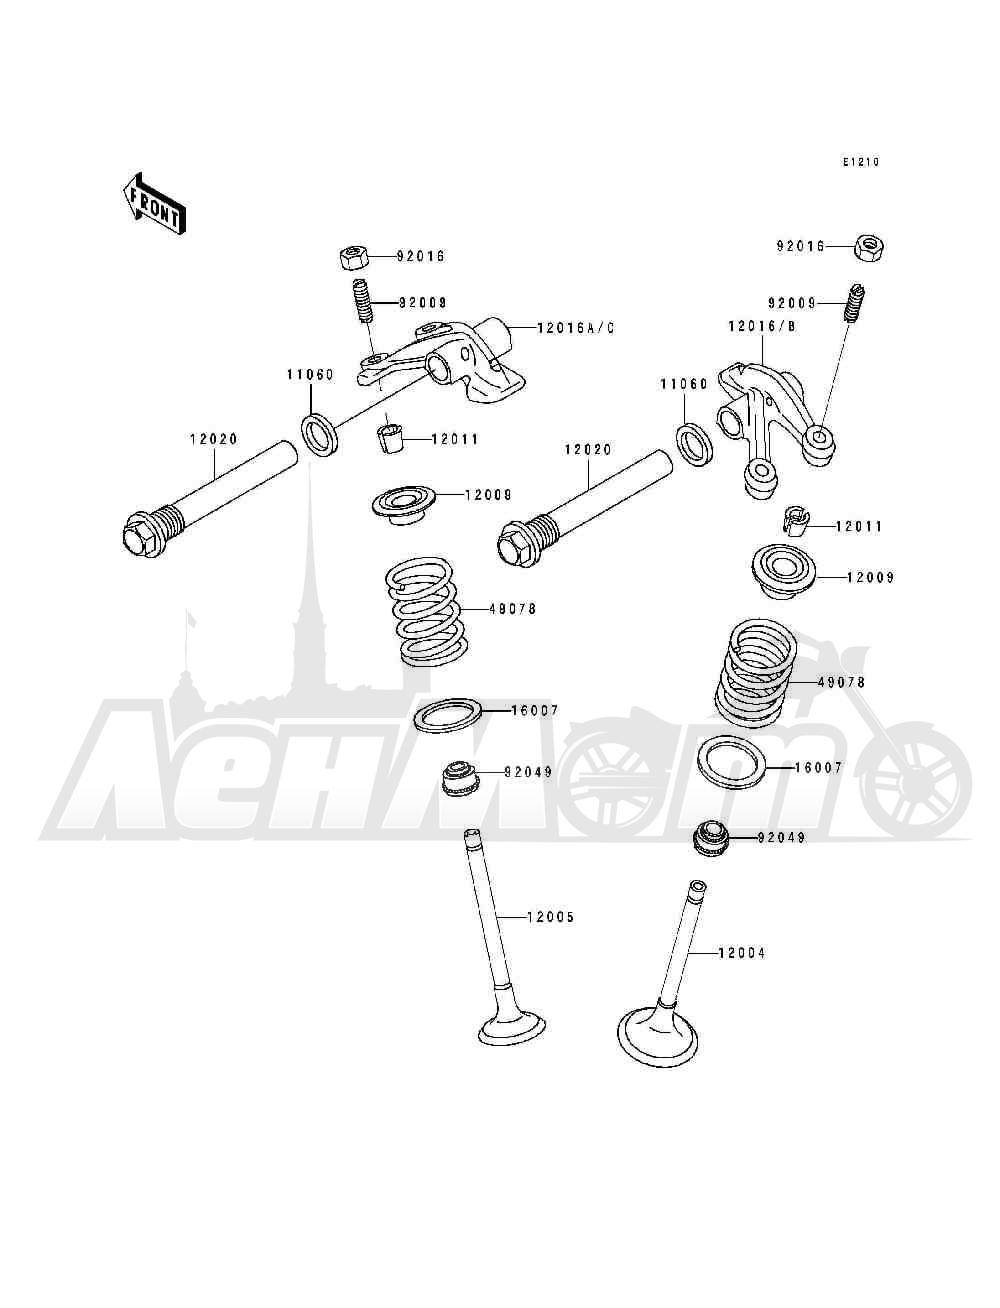 Запчасти для Квадроцикла Kawasaki 1994 BAYOU 400 4X4 (KLF400-B2) Раздел: VALVE(S) | клапан (S)